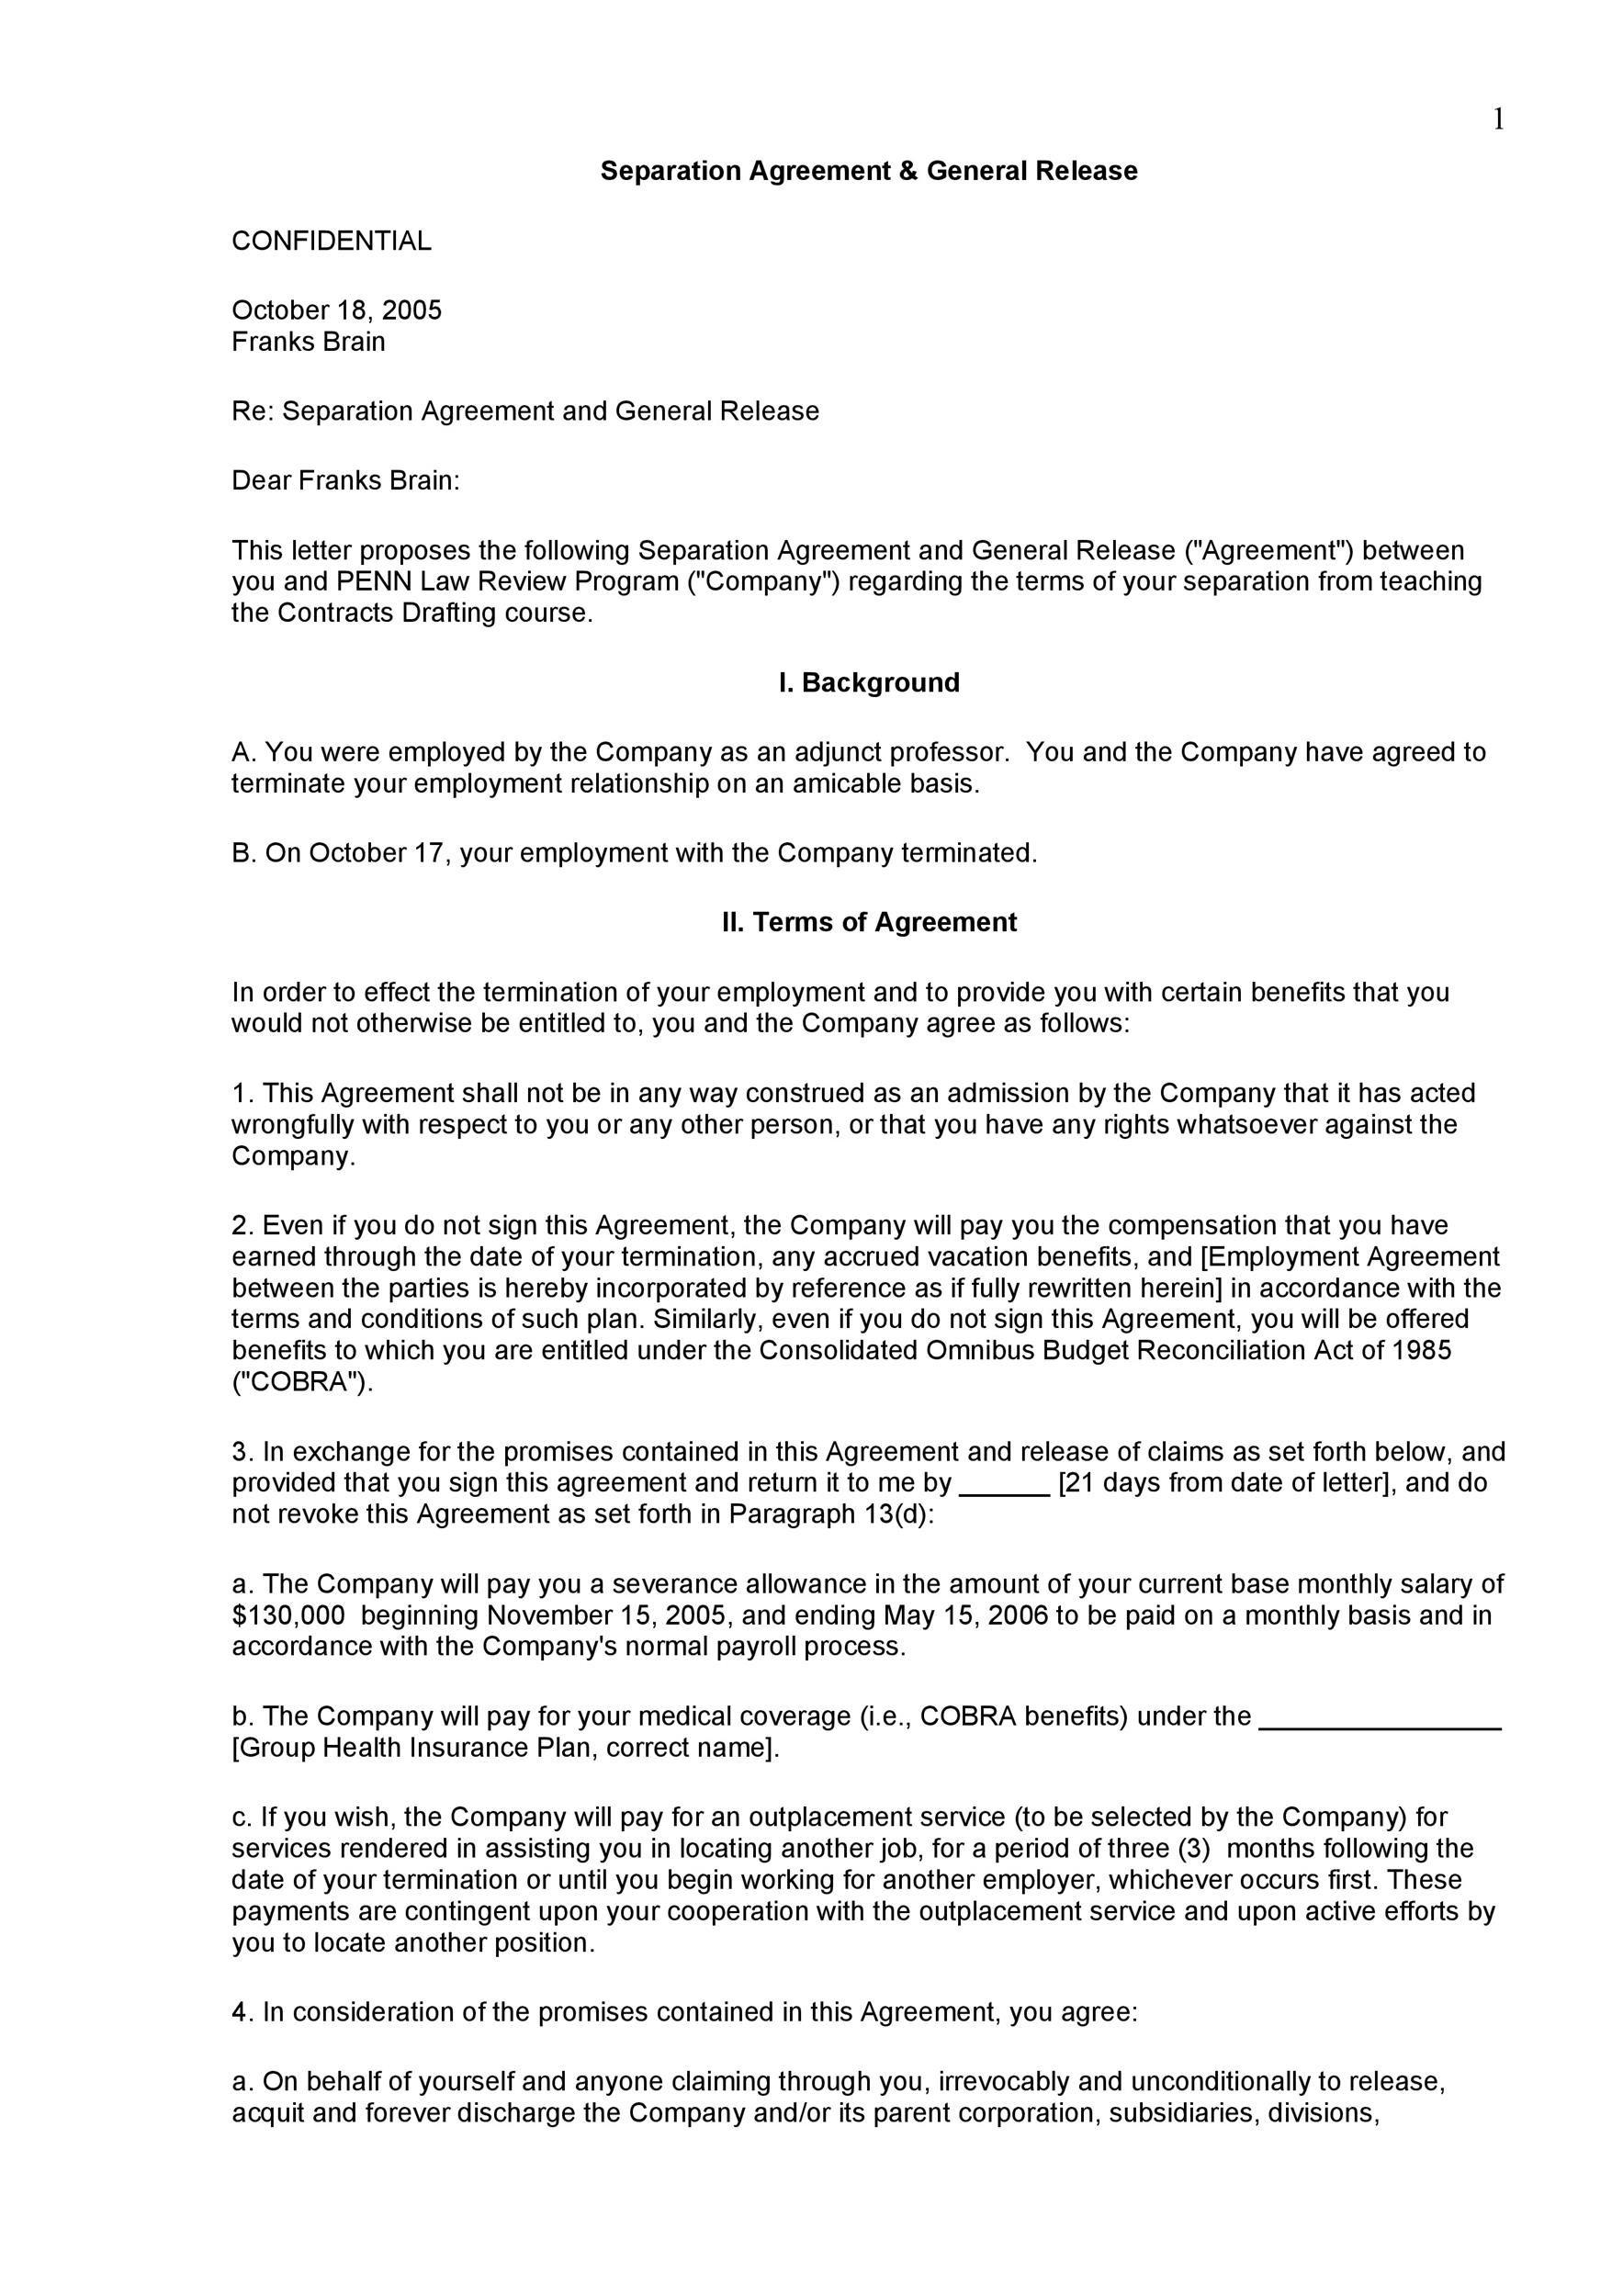 006 Unique Busines Partnership Separation Agreement Template Concept  Partner TerminationFull